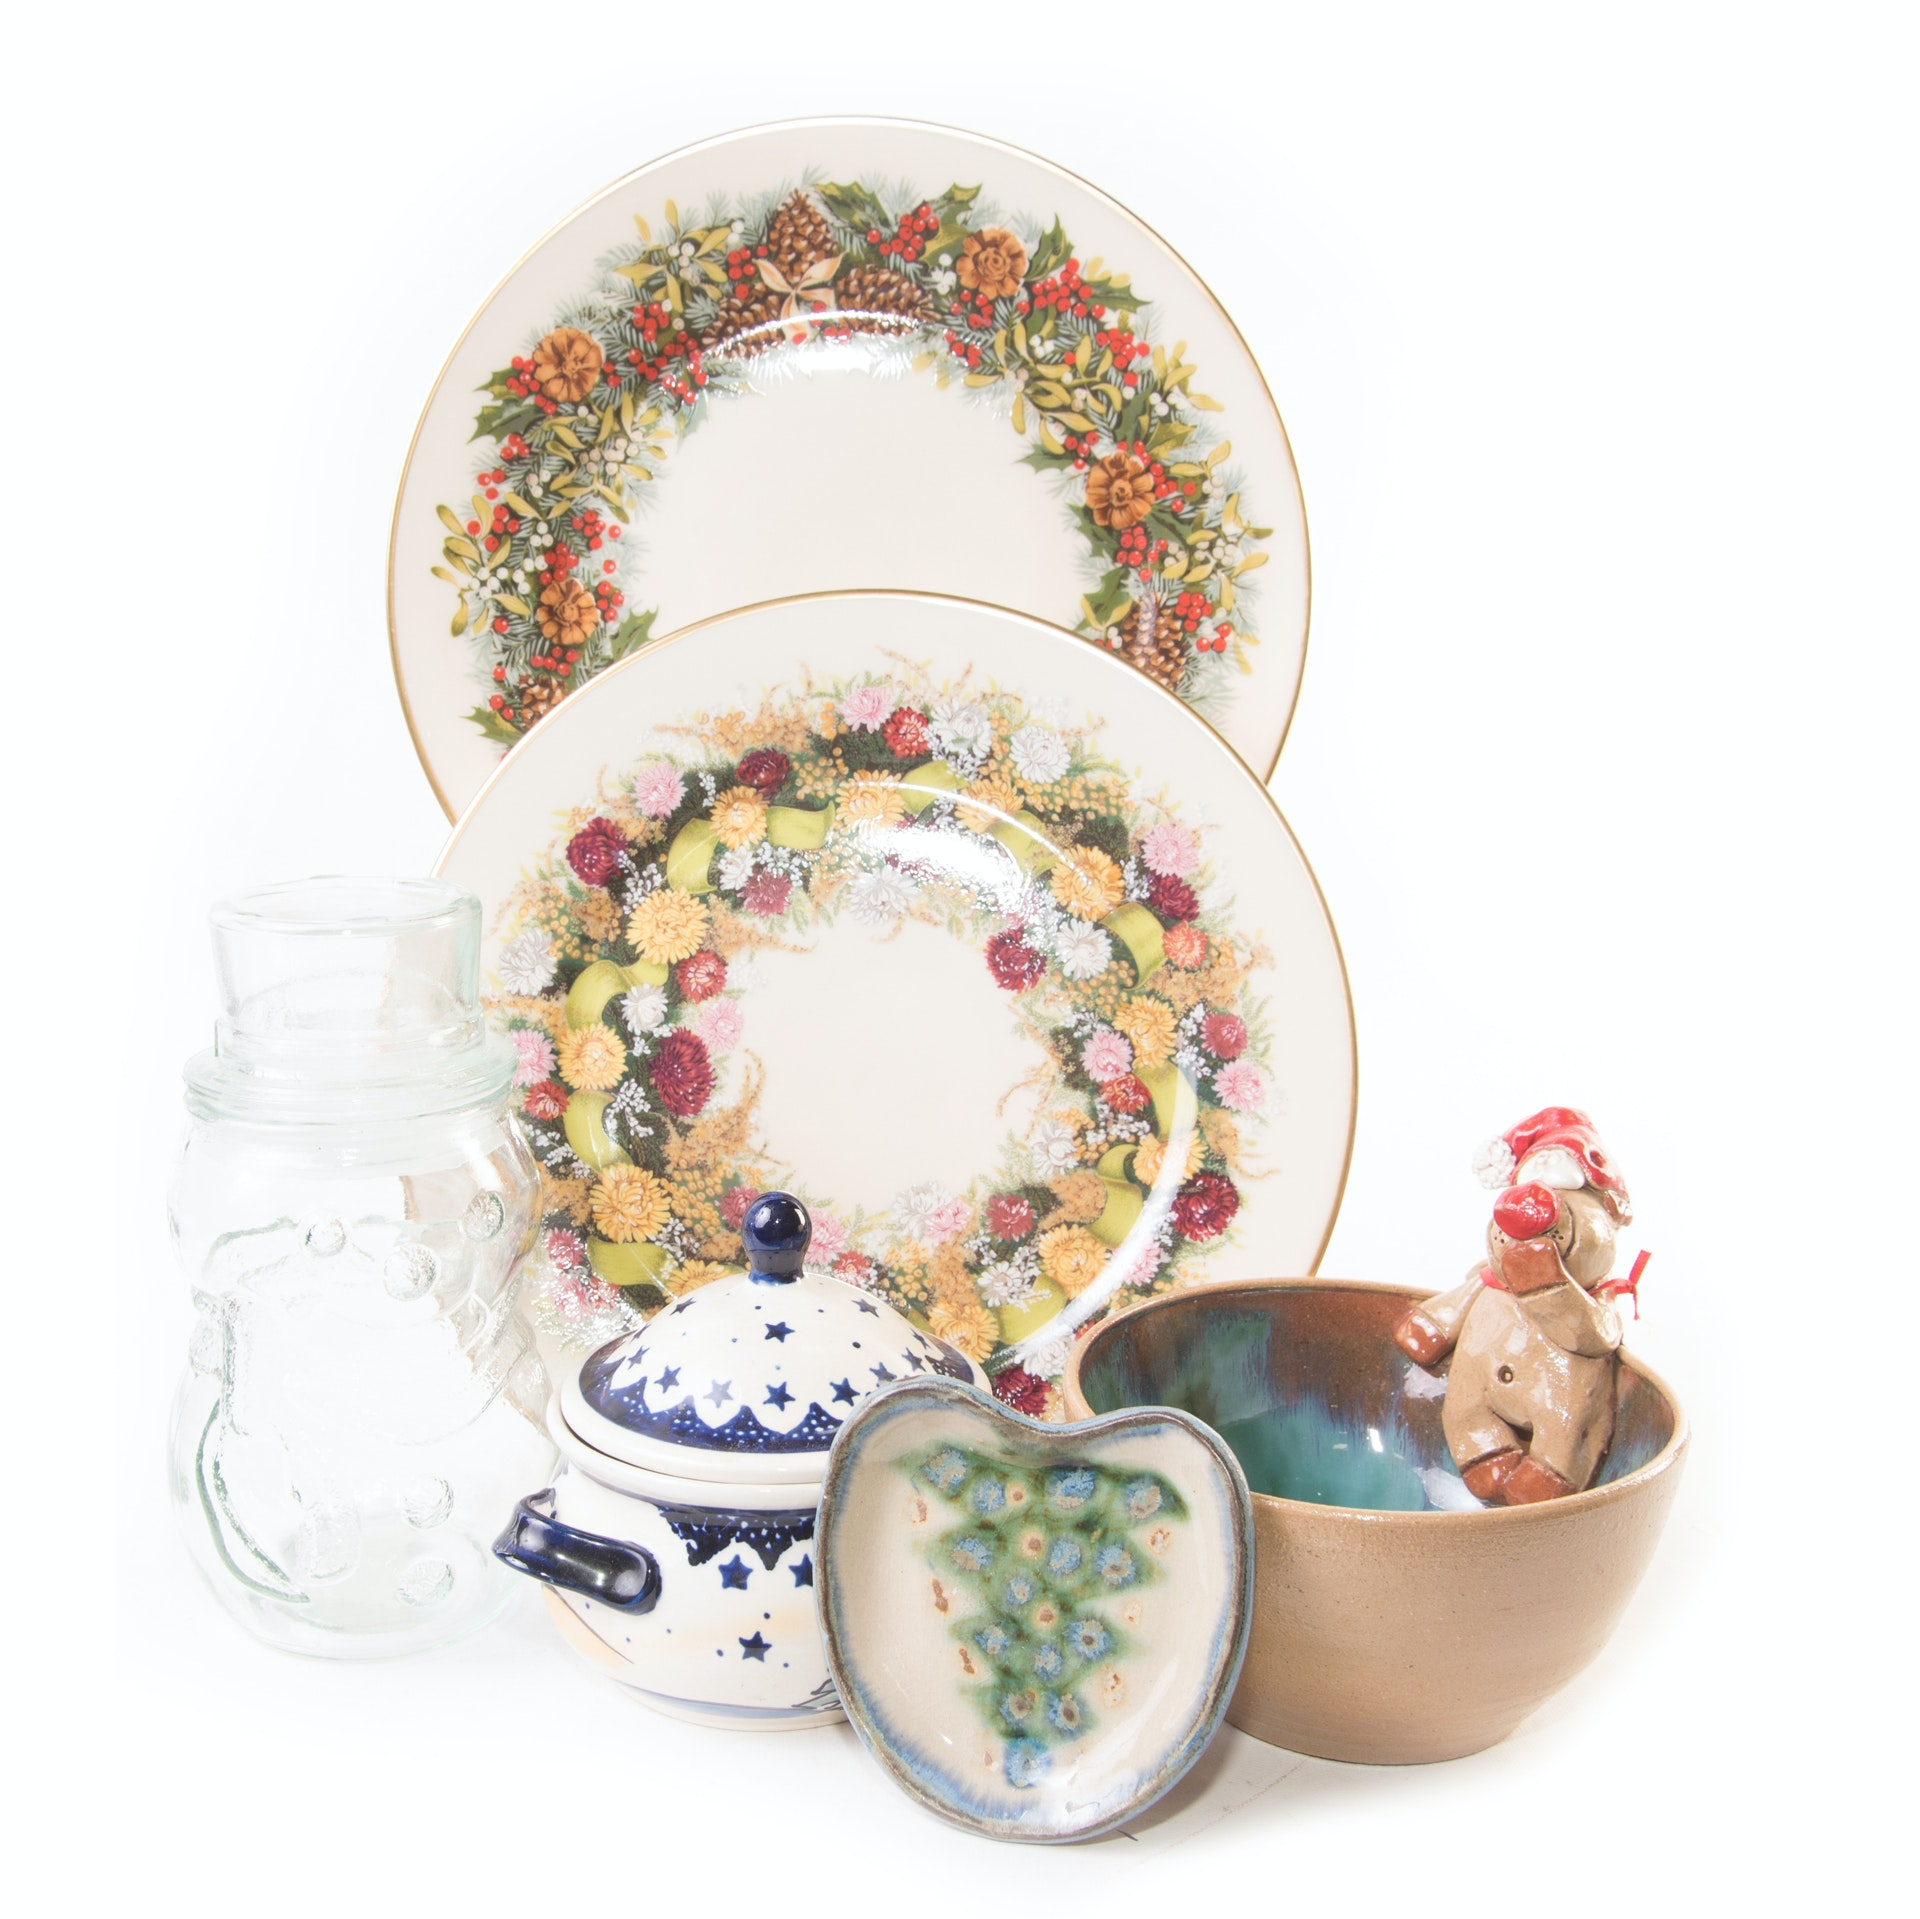 Christmas Decor Featuring Lenox Annual Plates